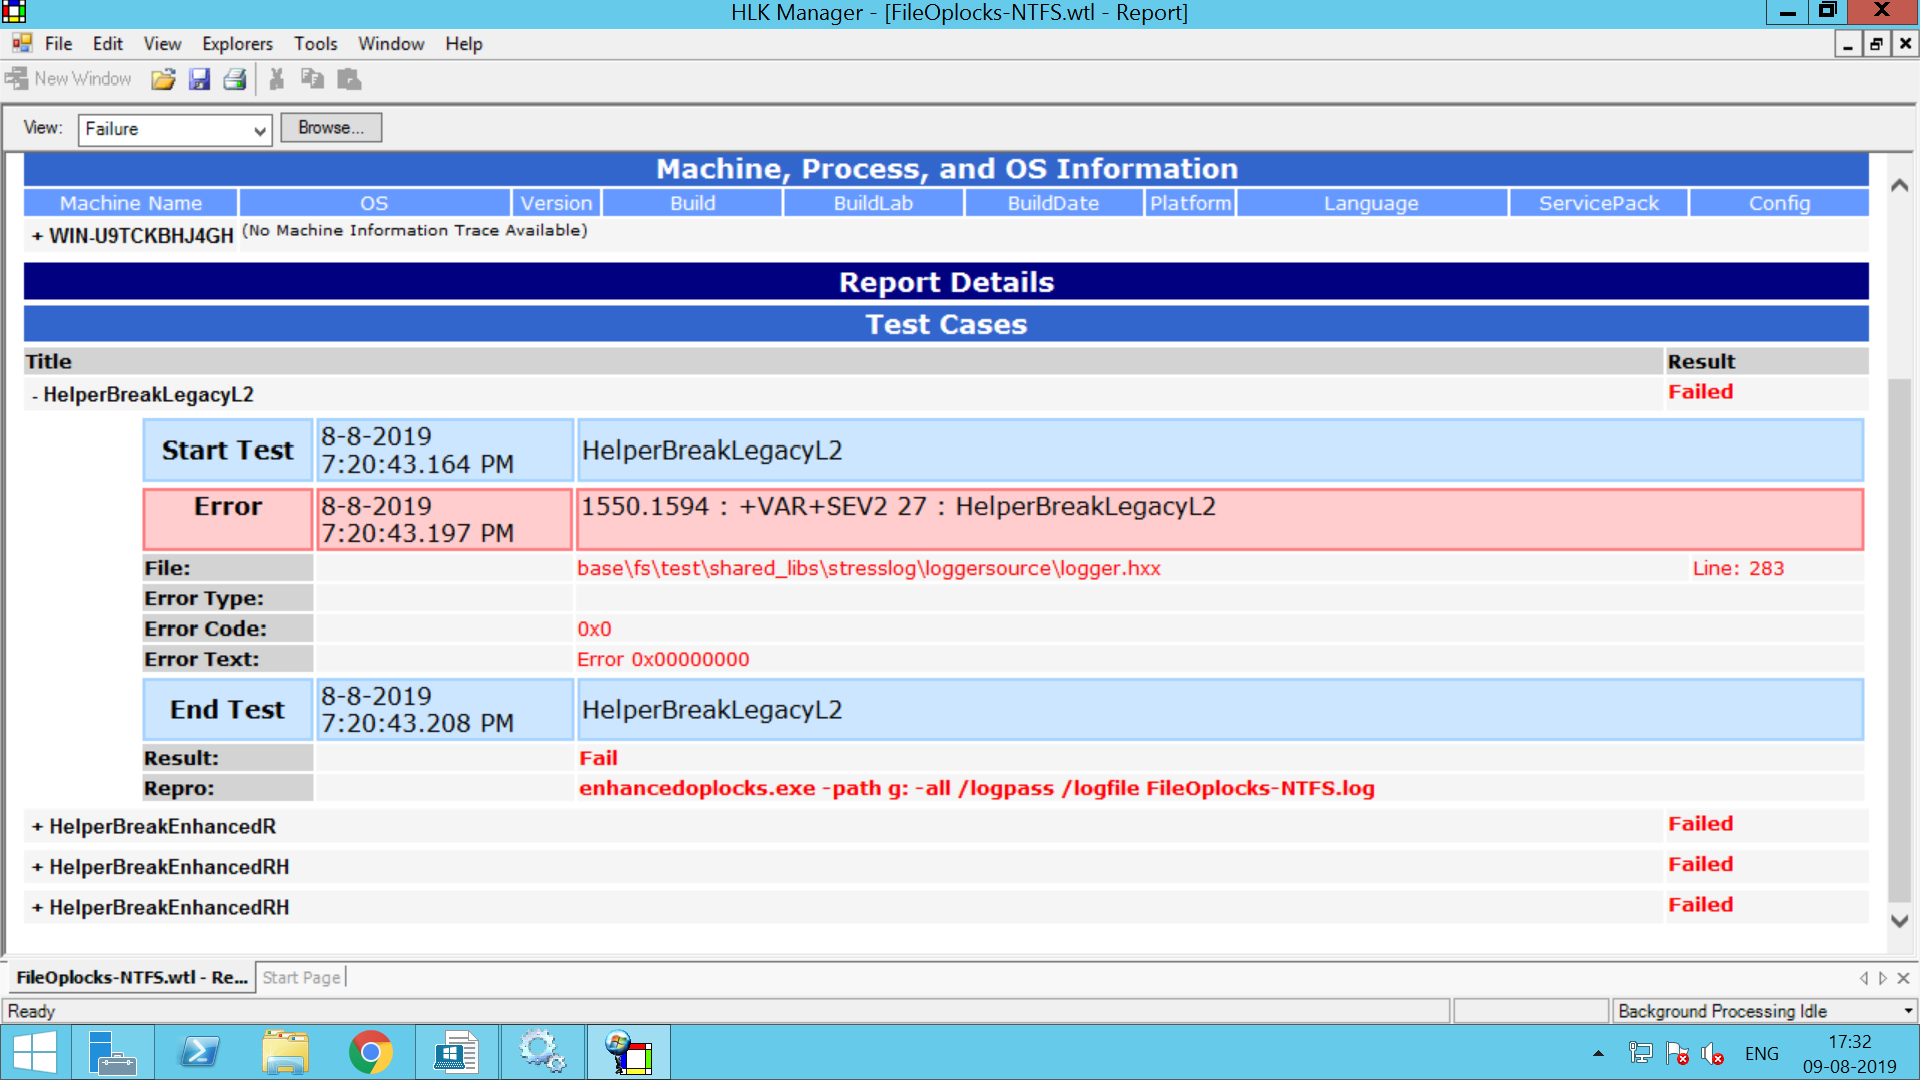 HLK Test fails for Windows Server 2016 ca12fa08-2b51-4b96-9809-15b3025ff381?upload=true.png